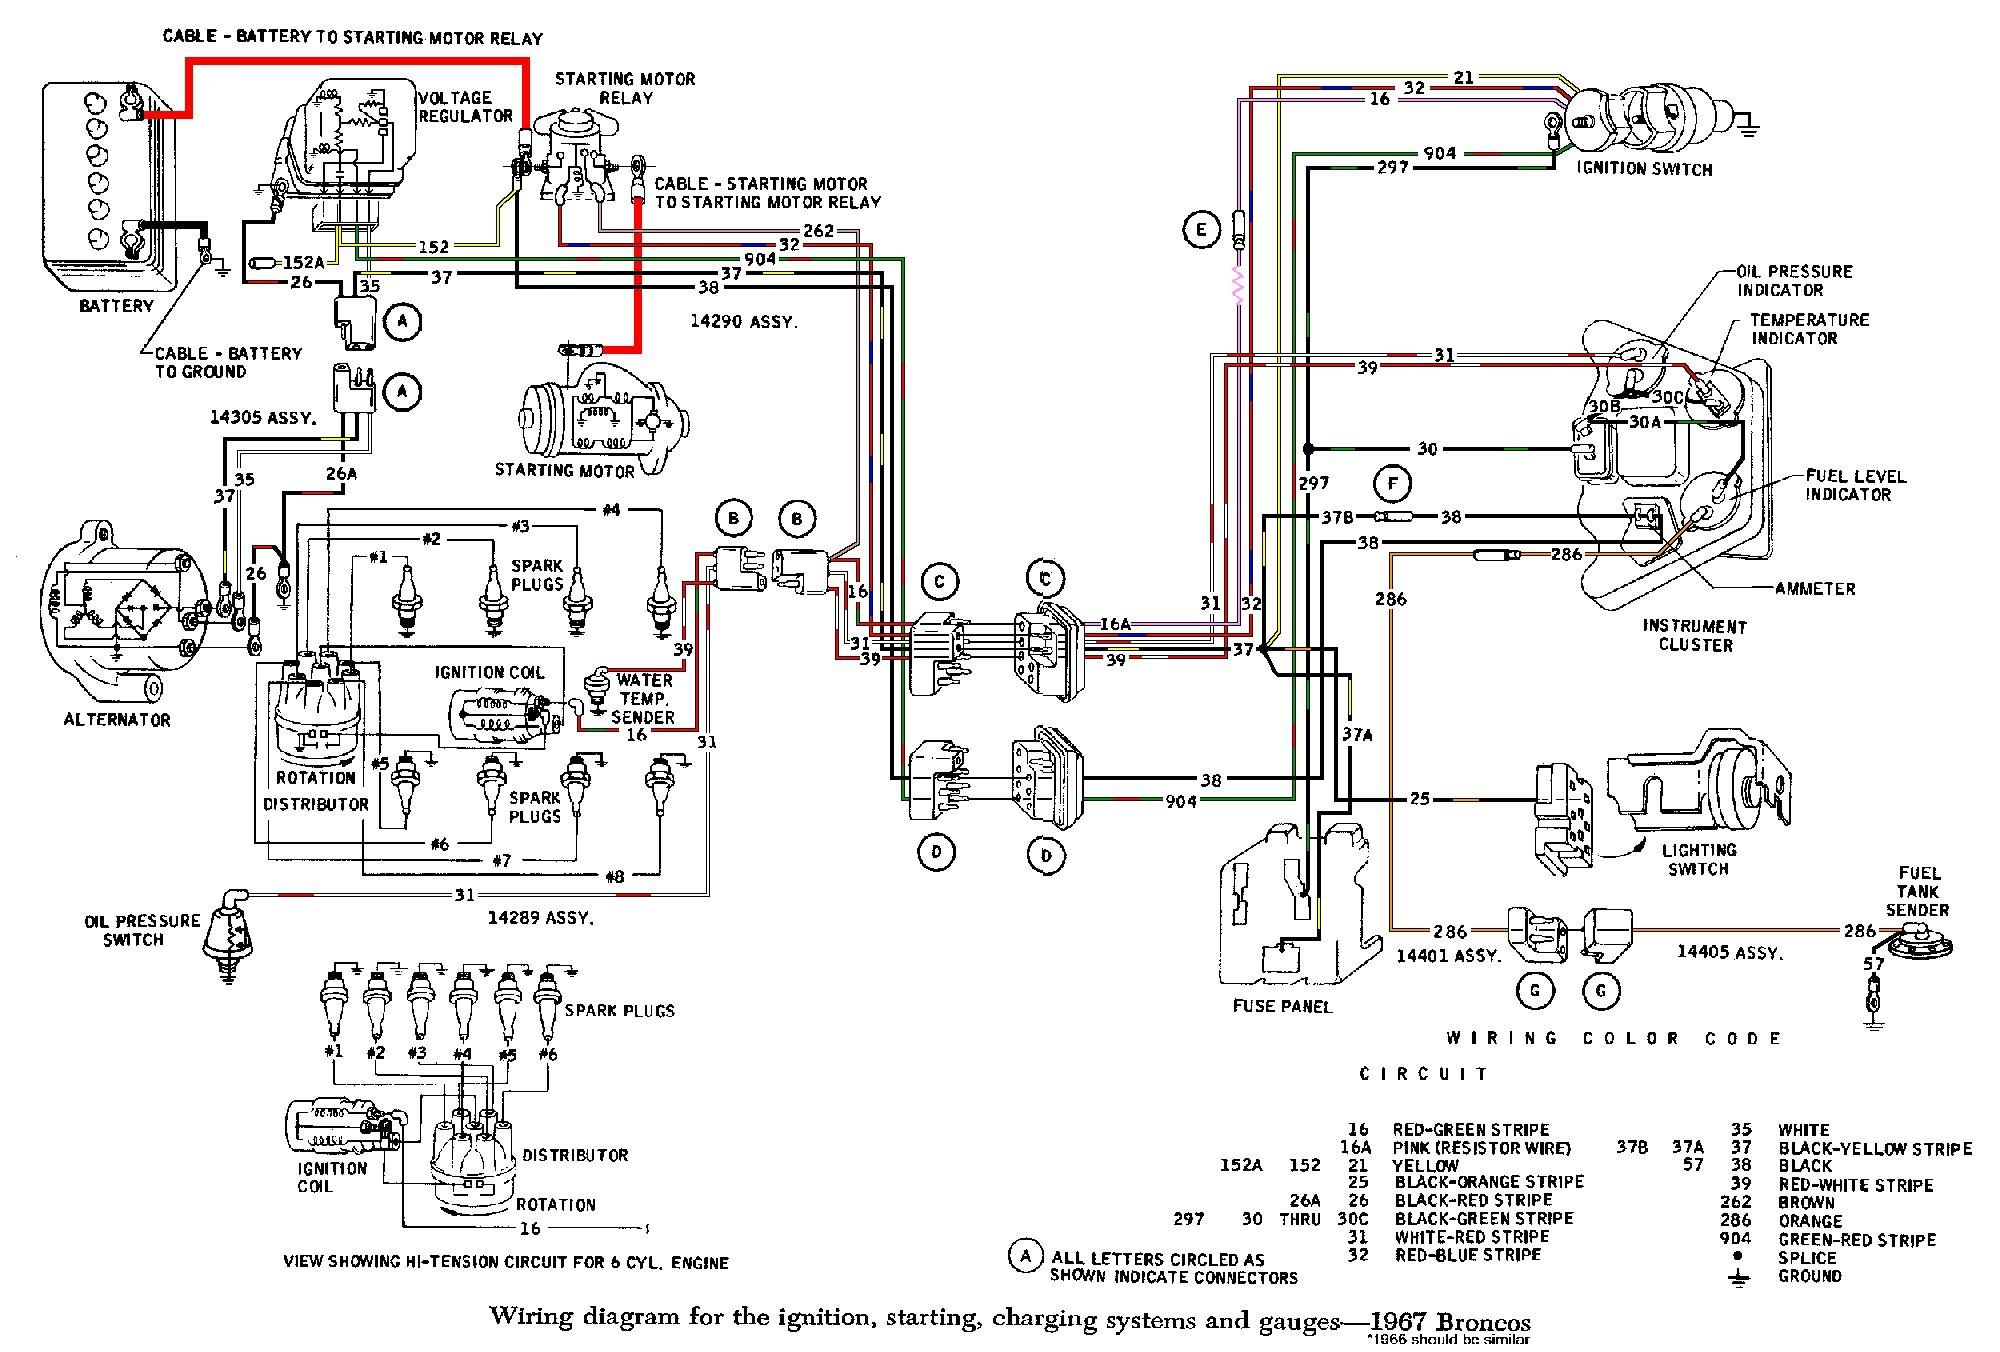 Car Radio Wiring Early Bronco Wiring Diagram Jvc Kd Sr40 Black Colour Car Rad Jvc Kd